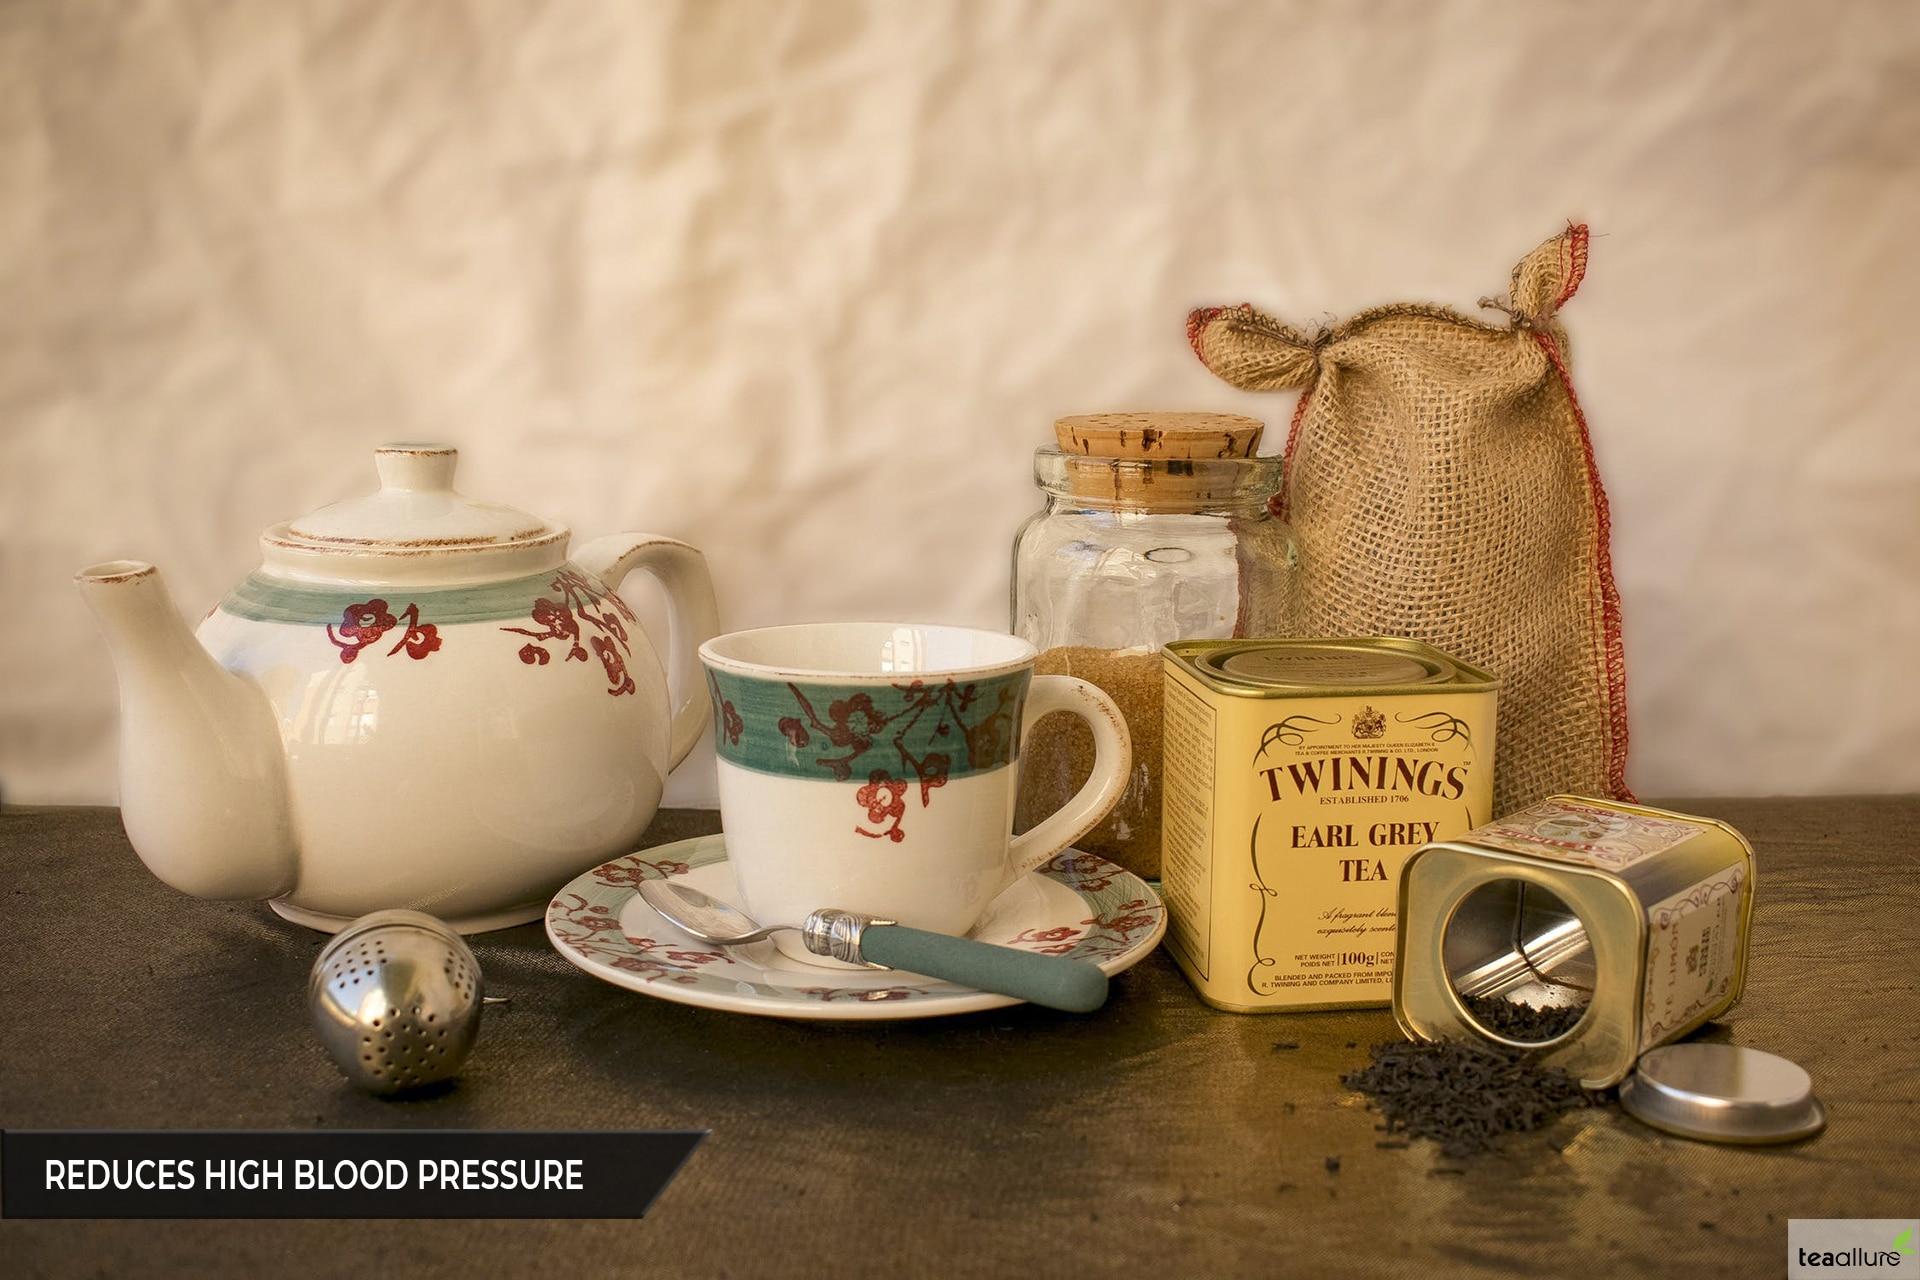 Black tea reduces high blood pressure